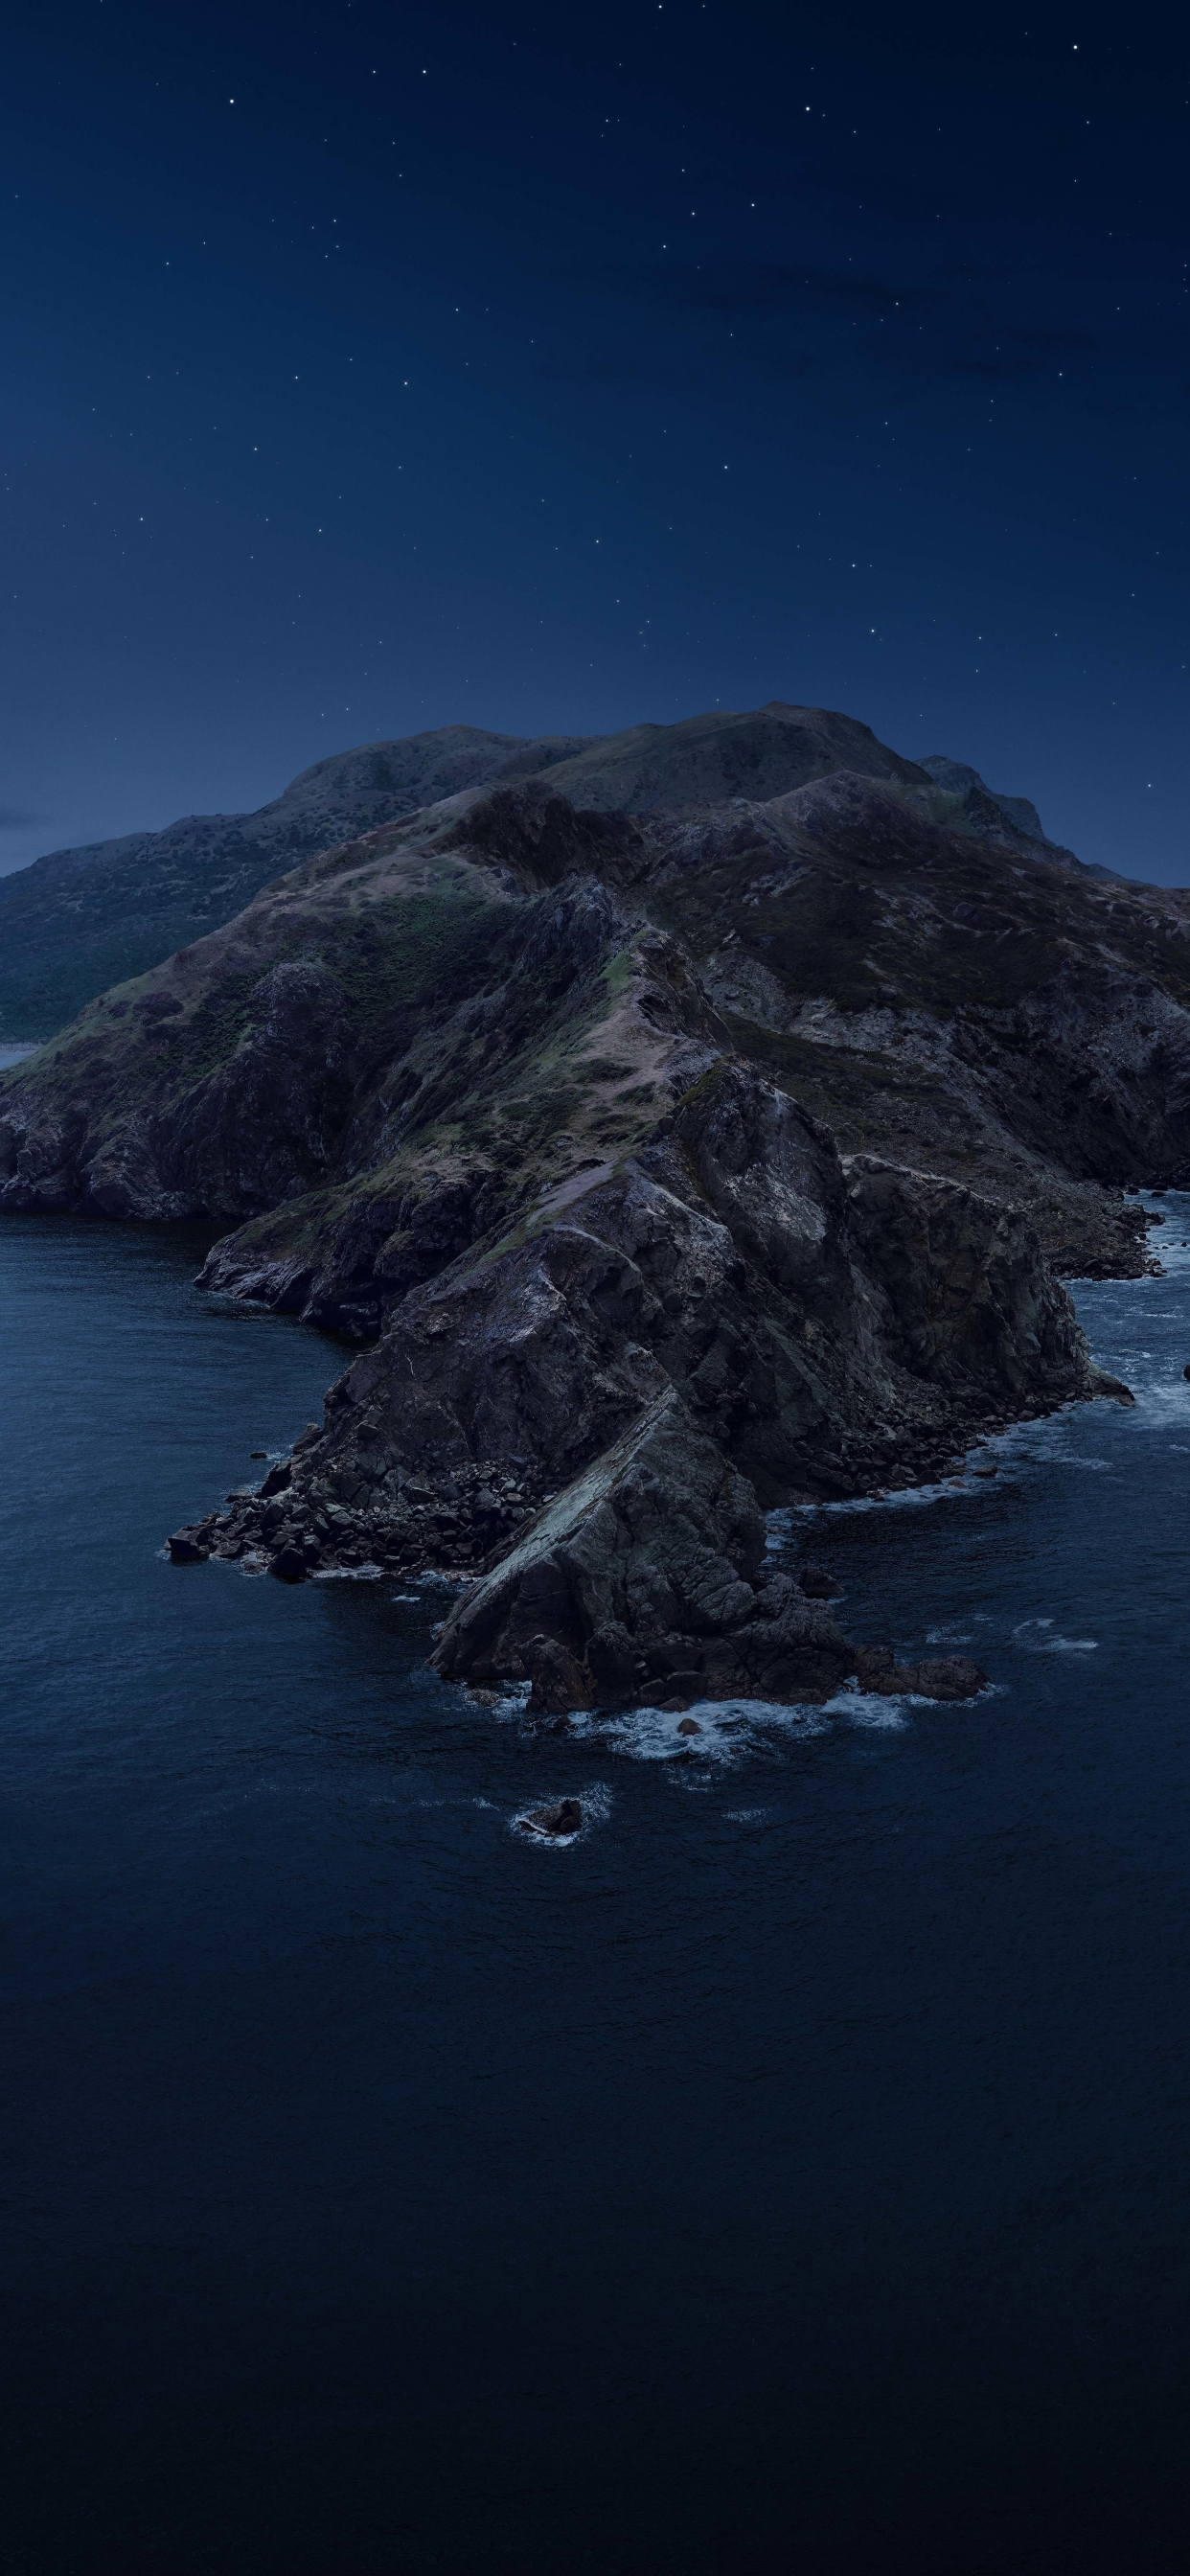 1242x2688 Macos Catalina Mountains Iphone Xs Max Wallpaper